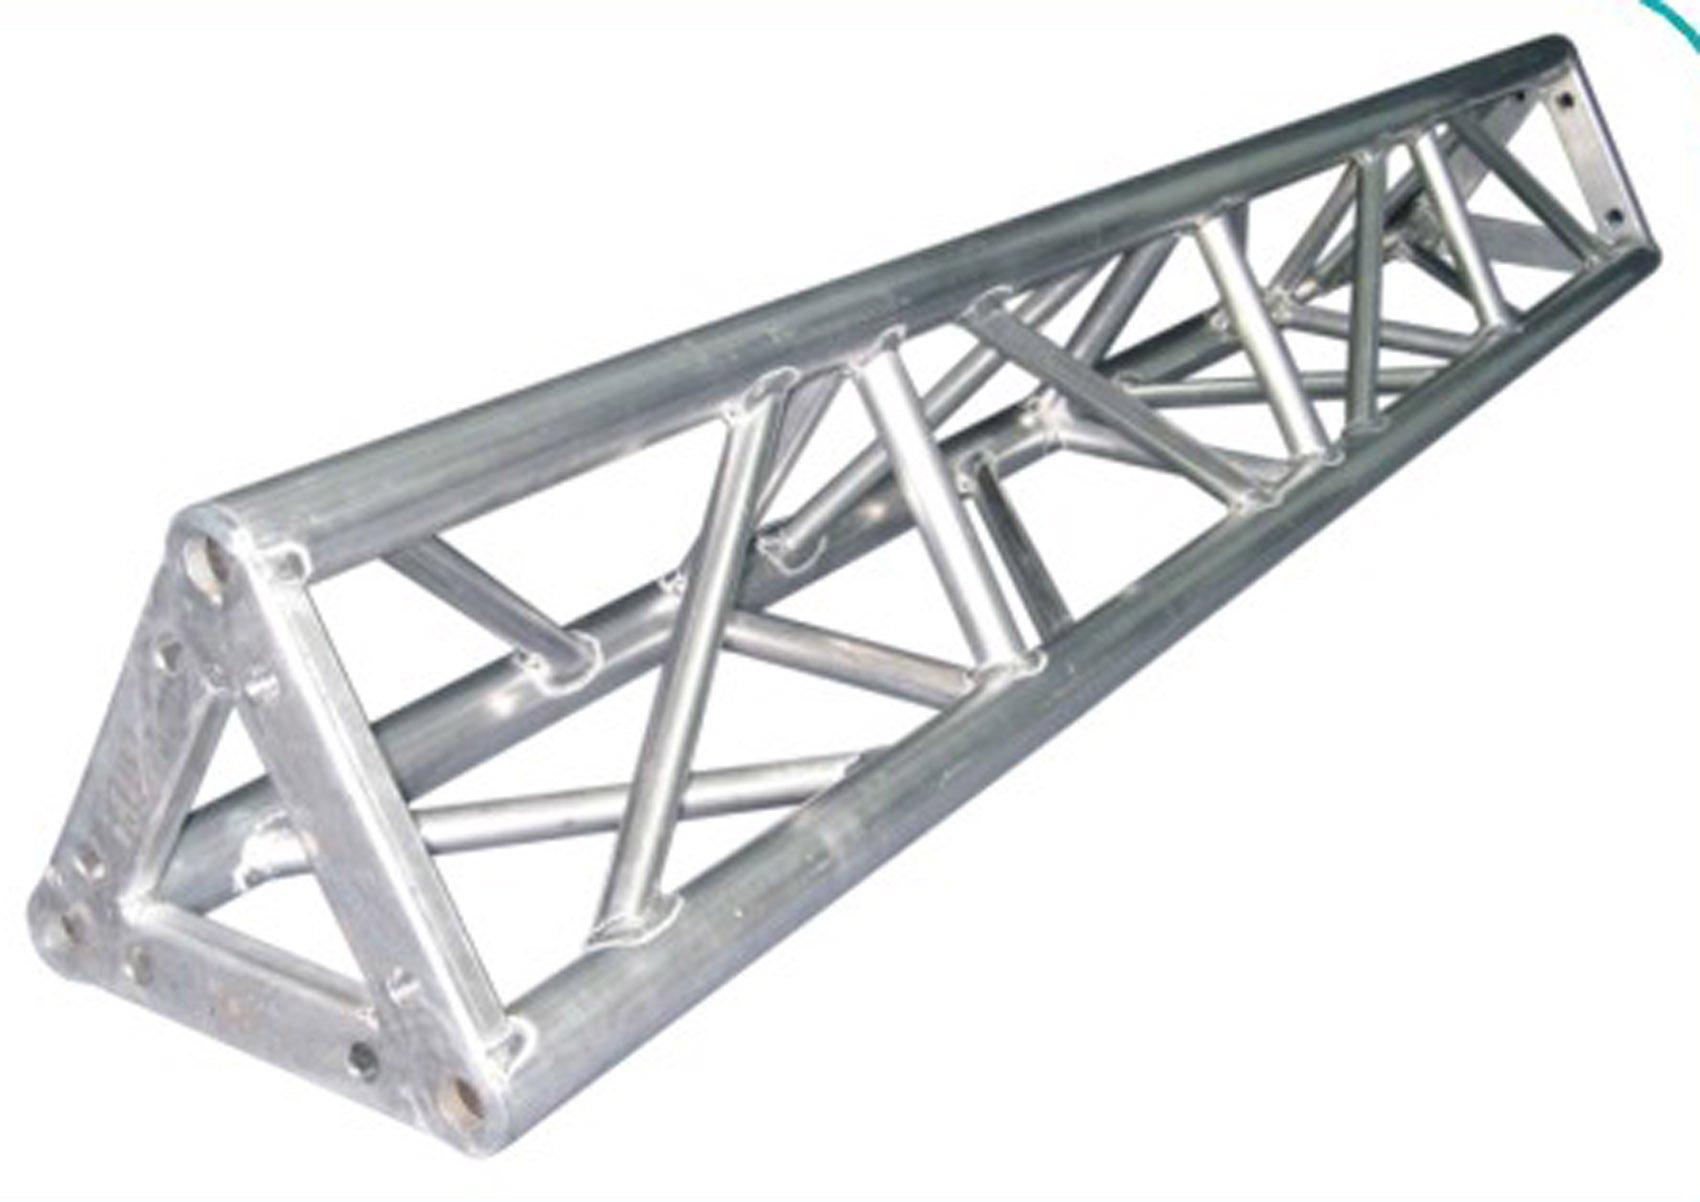 Aluminum Outdoor Lighting Truss Stand